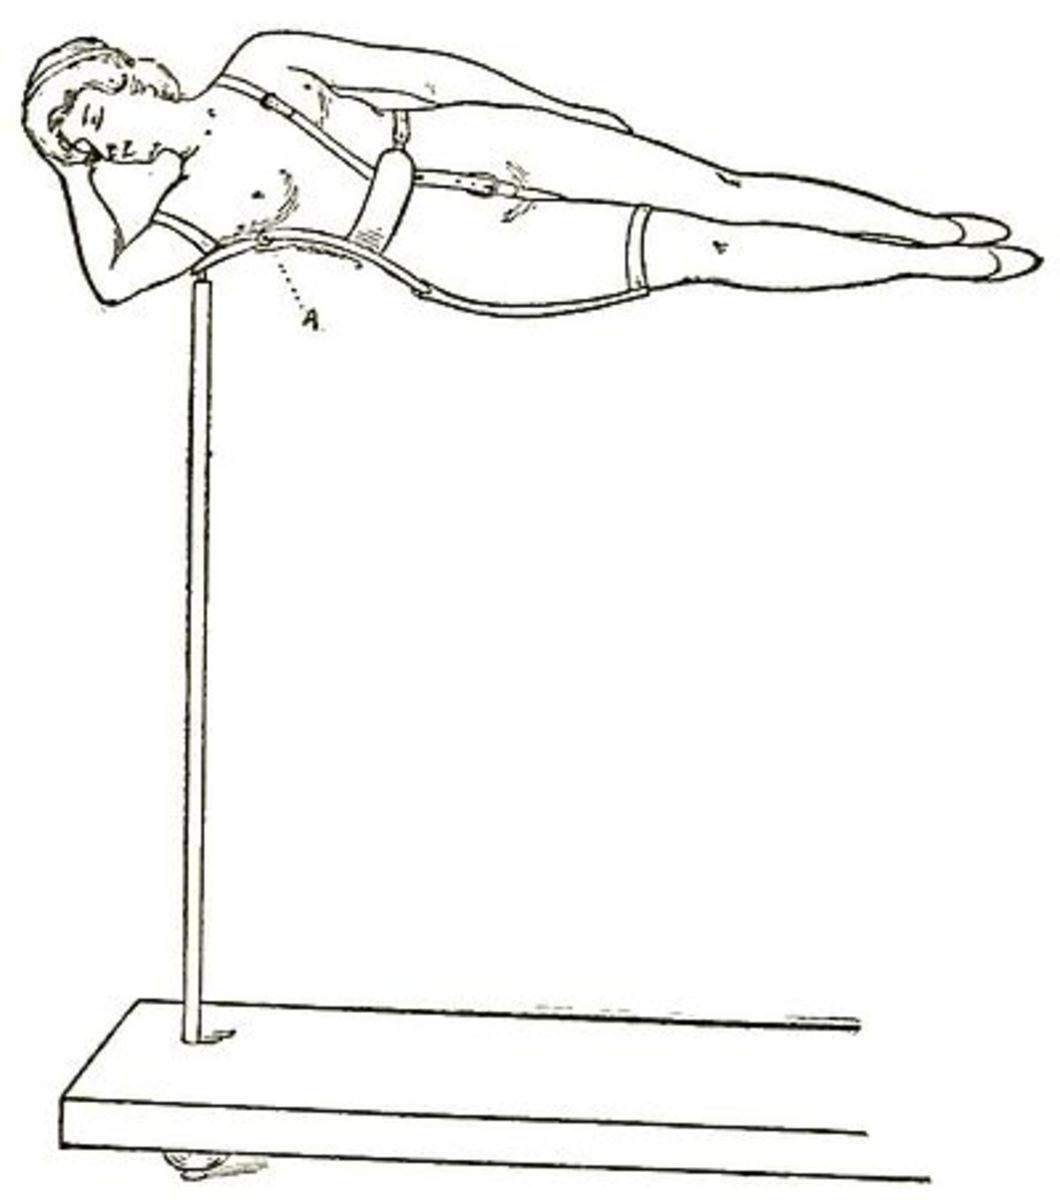 The Levitating Lady